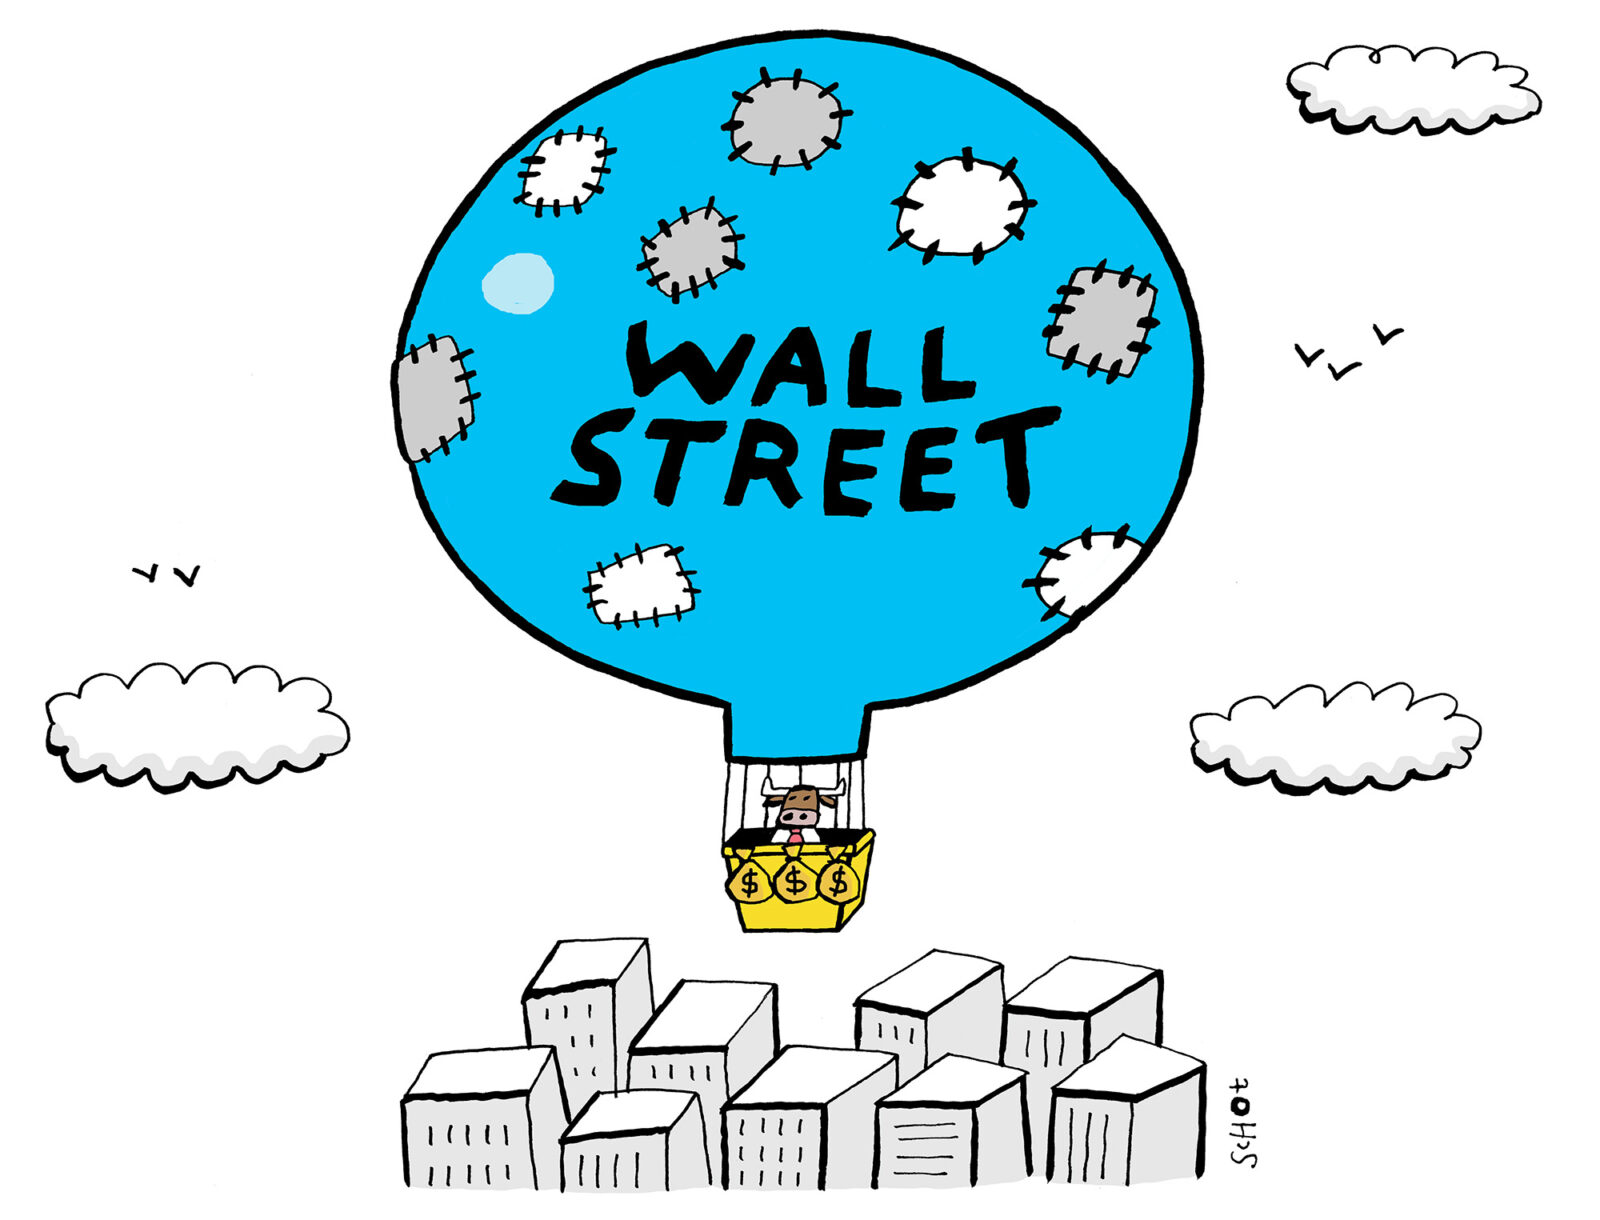 Kwestie – bubble wallstreet – Bas van der Schot